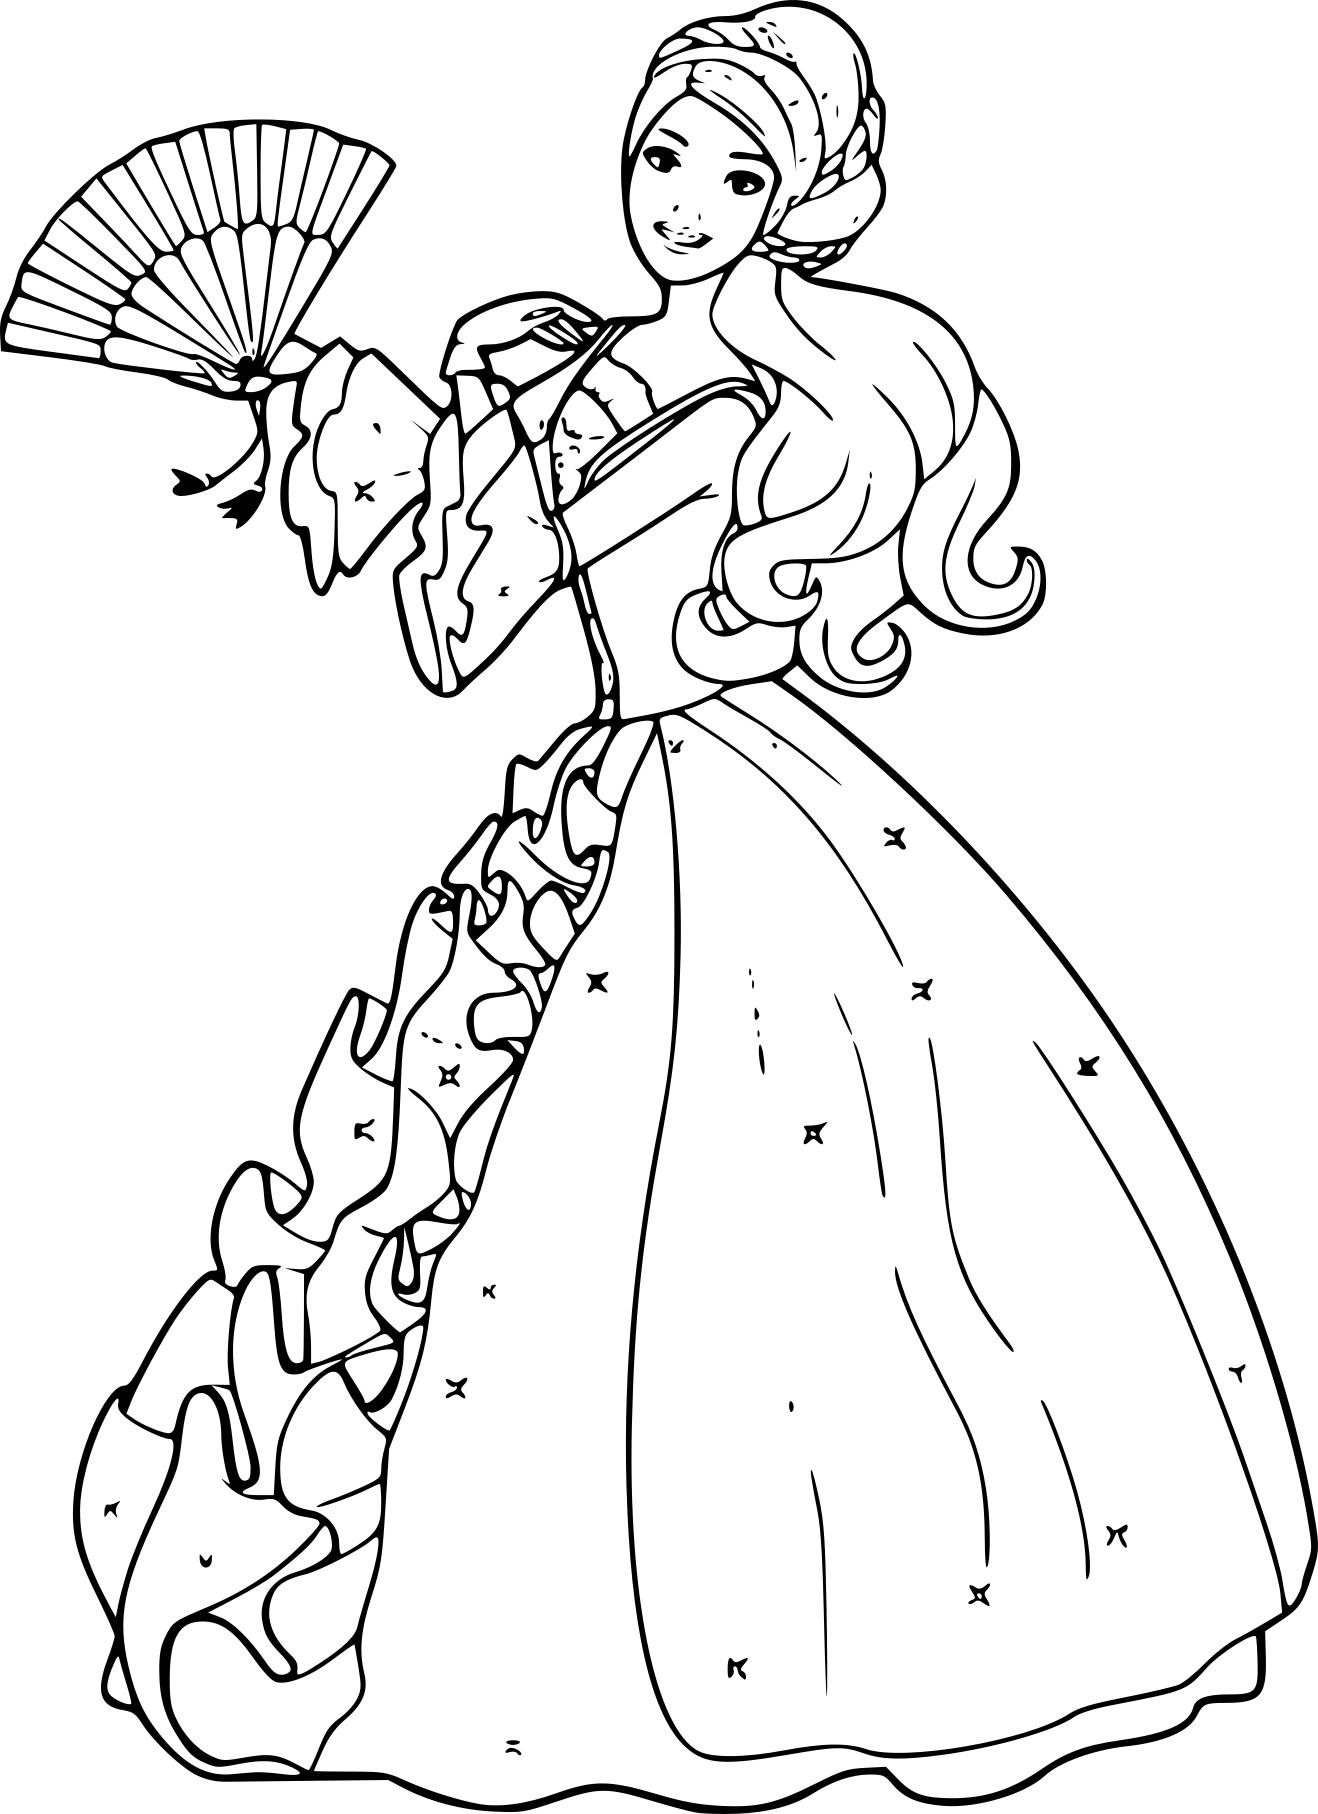 Coloriage Barbie Princesse À Imprimer Gratuit concernant Princesse À Colorier Gratuit